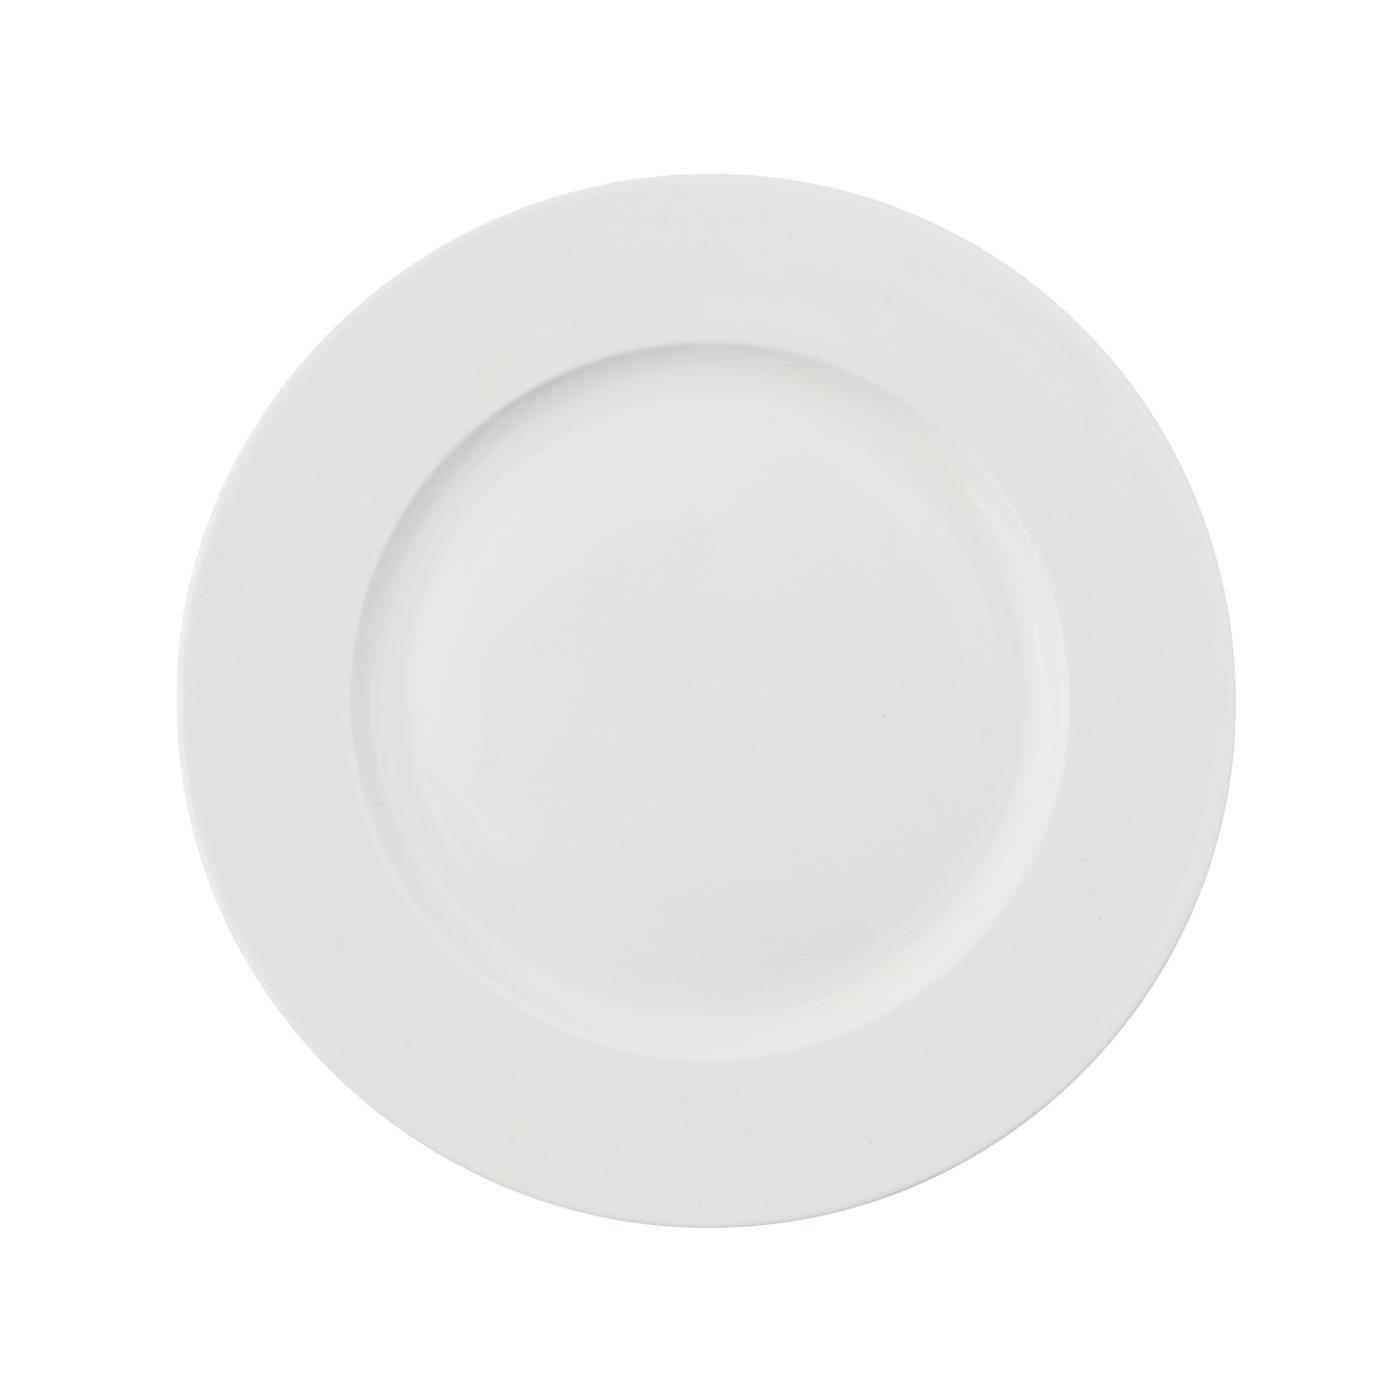 "White Monaco - Salad Plate 8.5"""